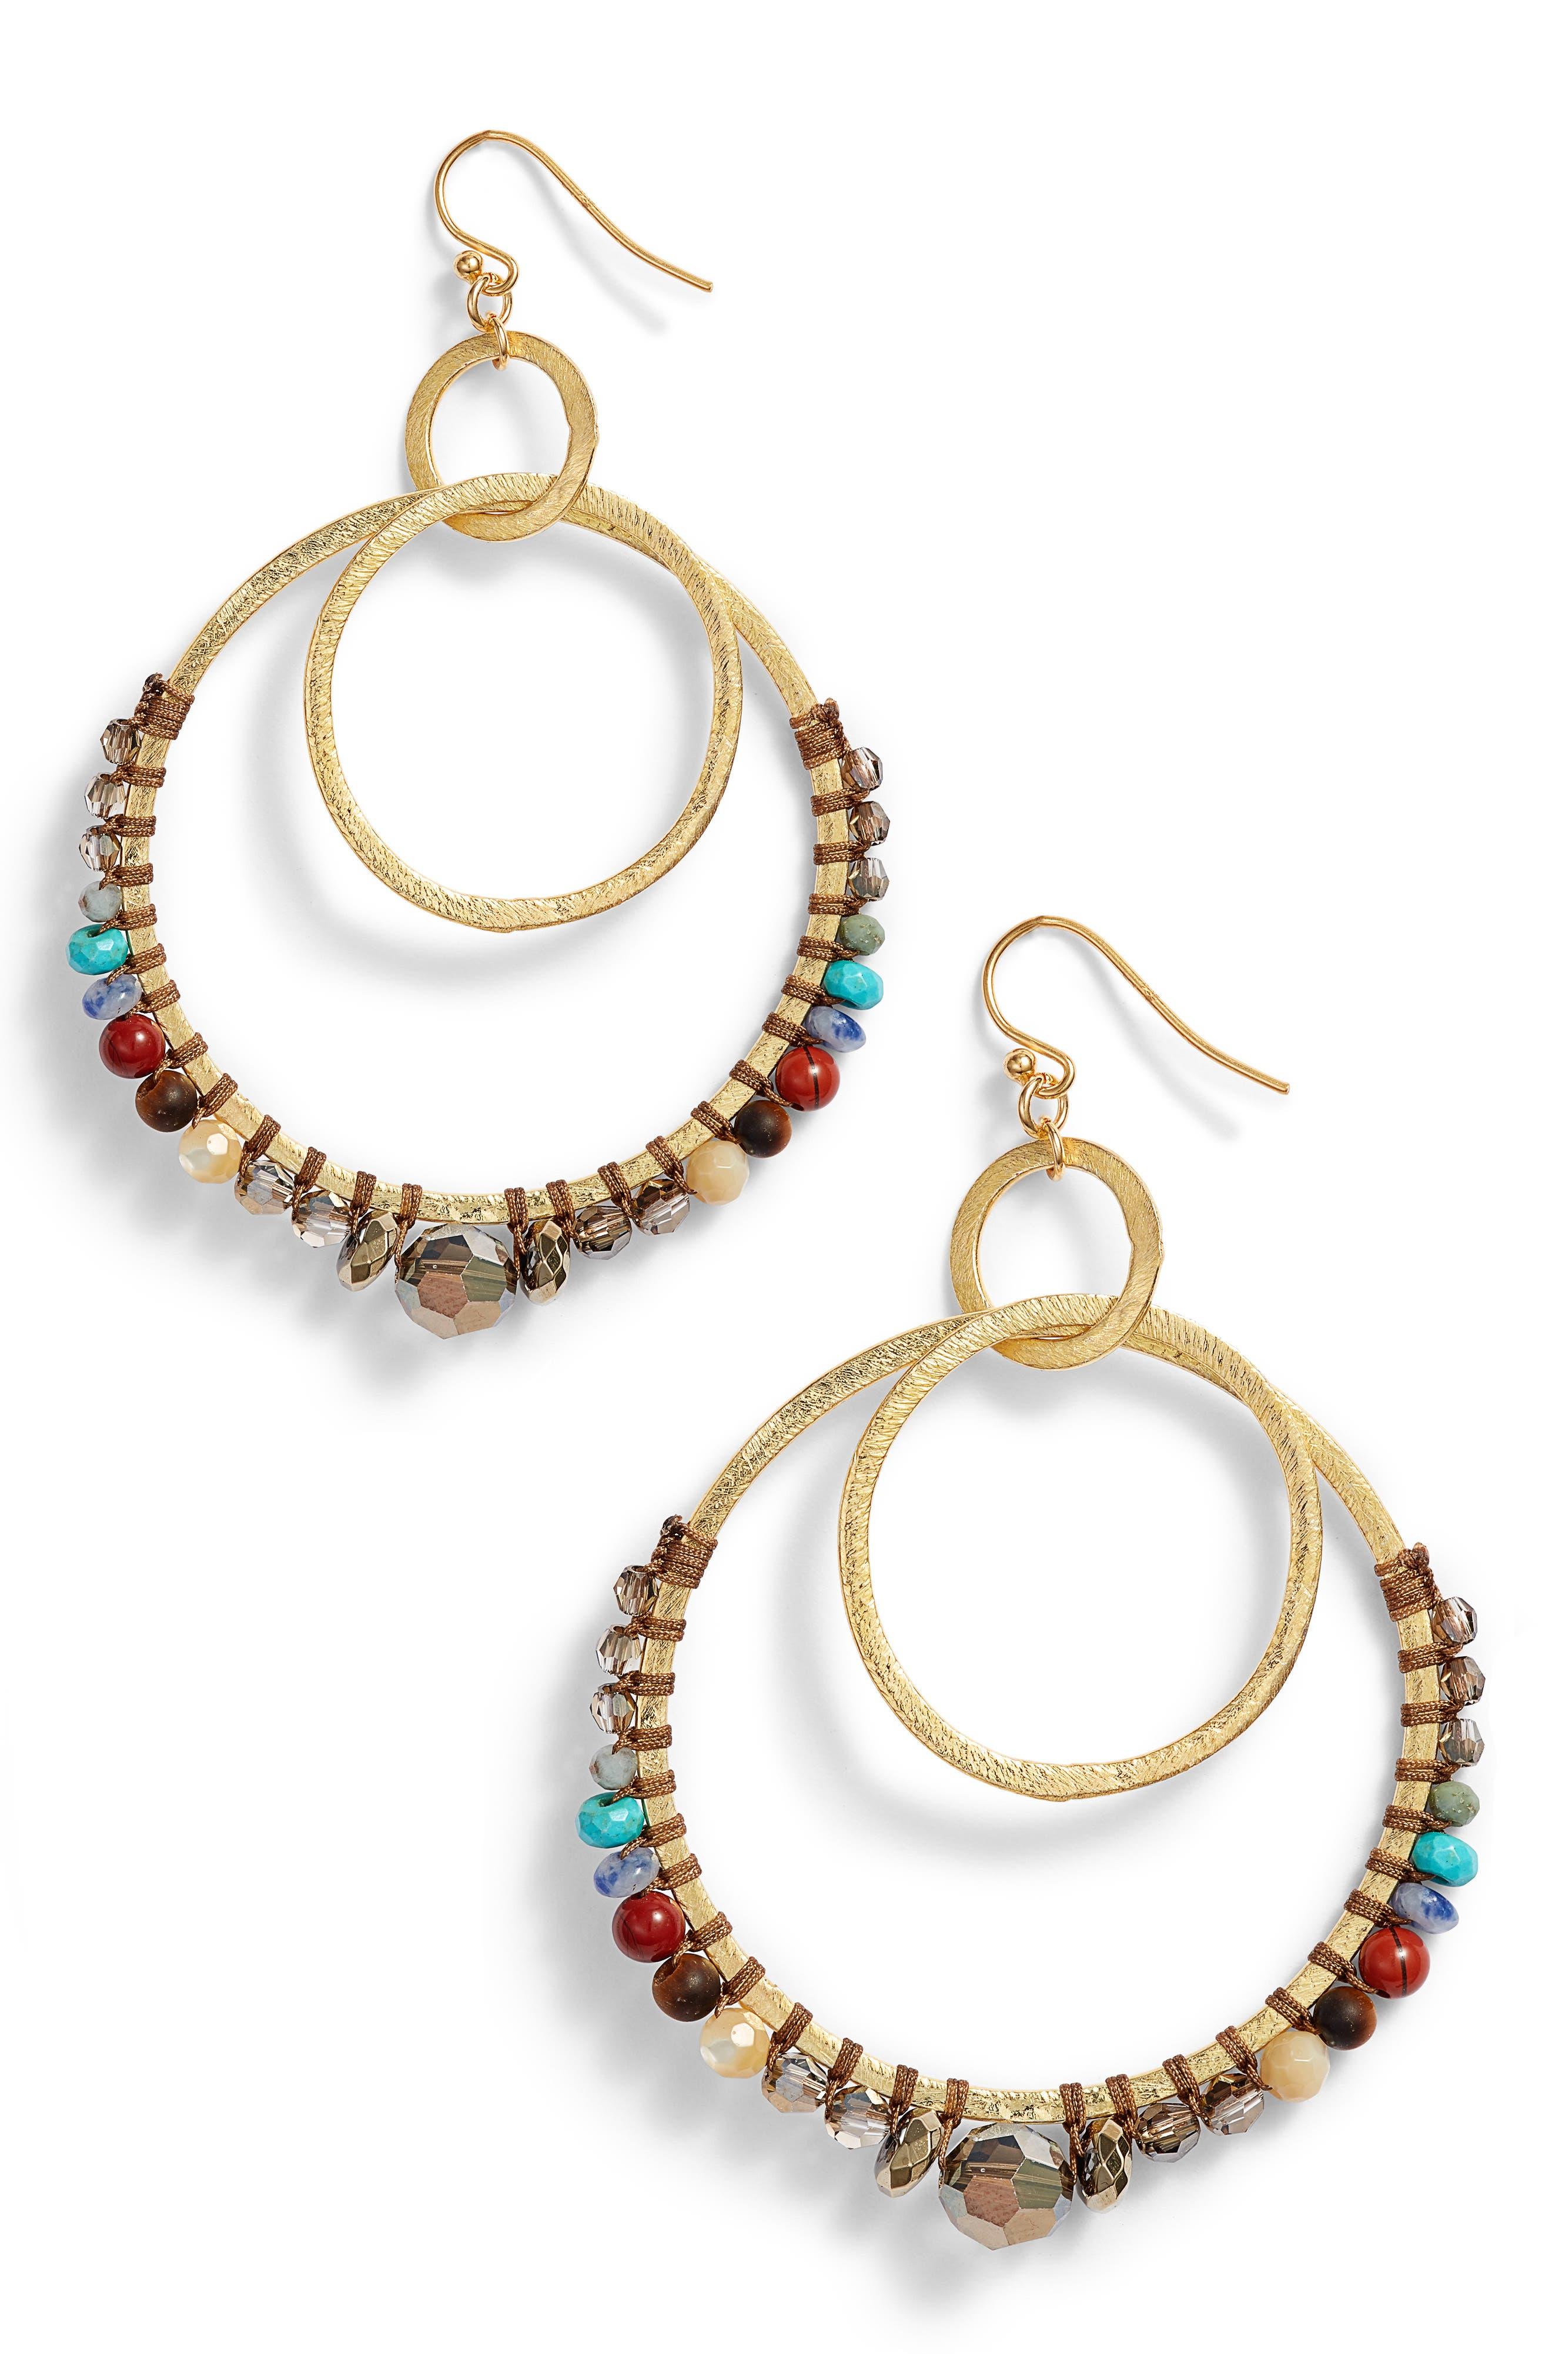 Beaded Double Hoop Earrings,                             Main thumbnail 1, color,                             BEIGE MULTI MIX